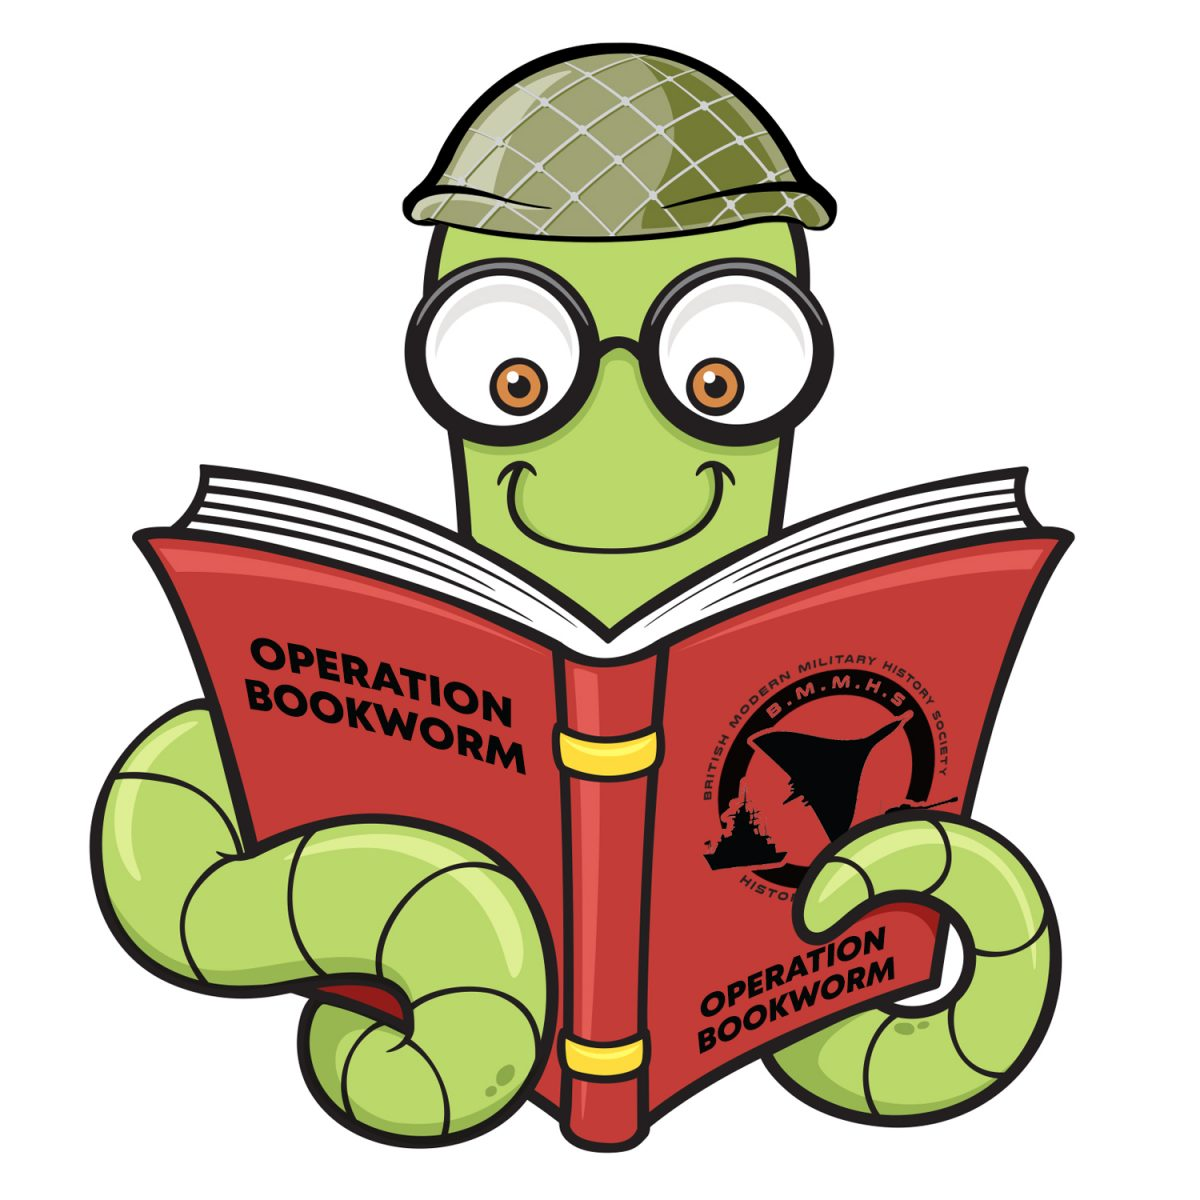 Operation Bookworm logo